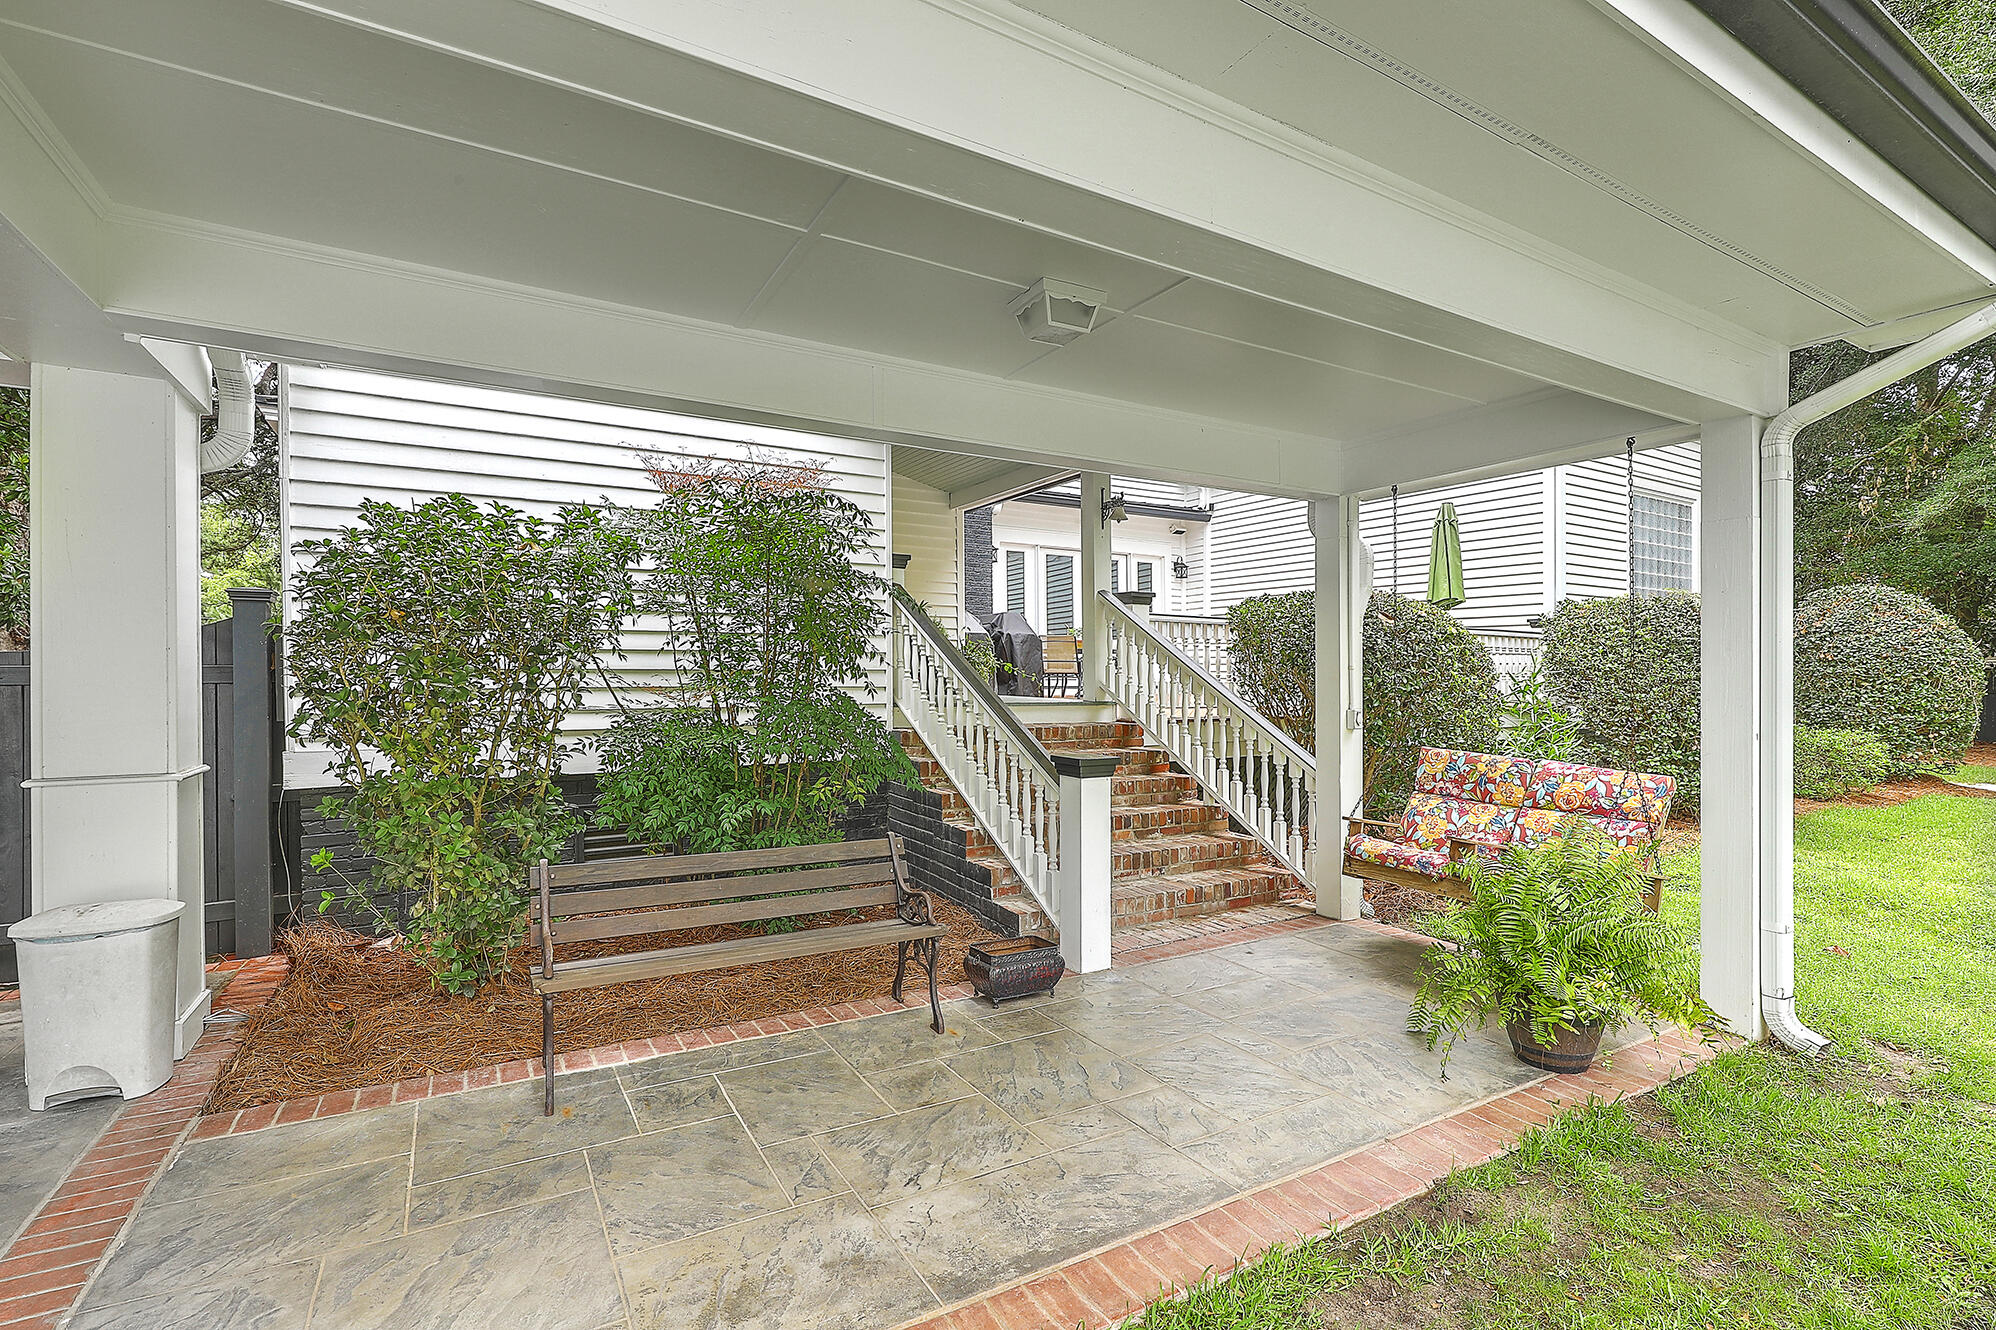 Summerville Homes For Sale - 102 Hickory, Summerville, SC - 89